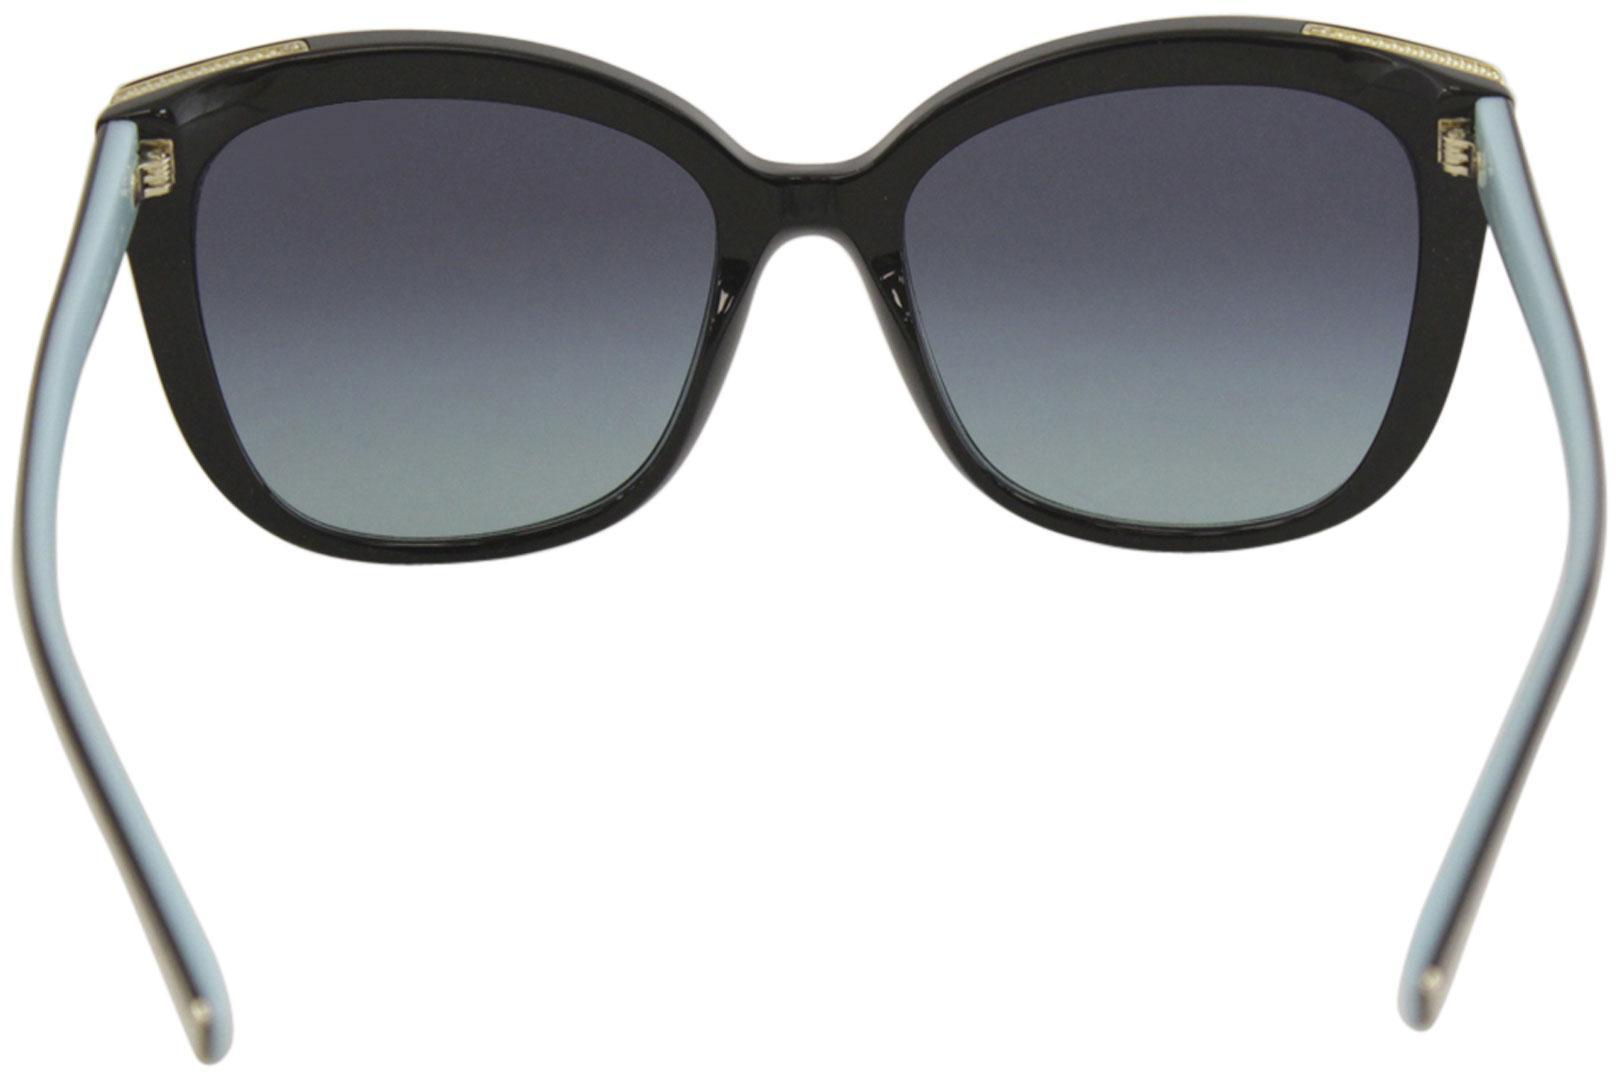 2bd878c850 Women s TF4150 TF 4150 Fashion Cat Eye Sunglasses by Tiffany   Co. 12345